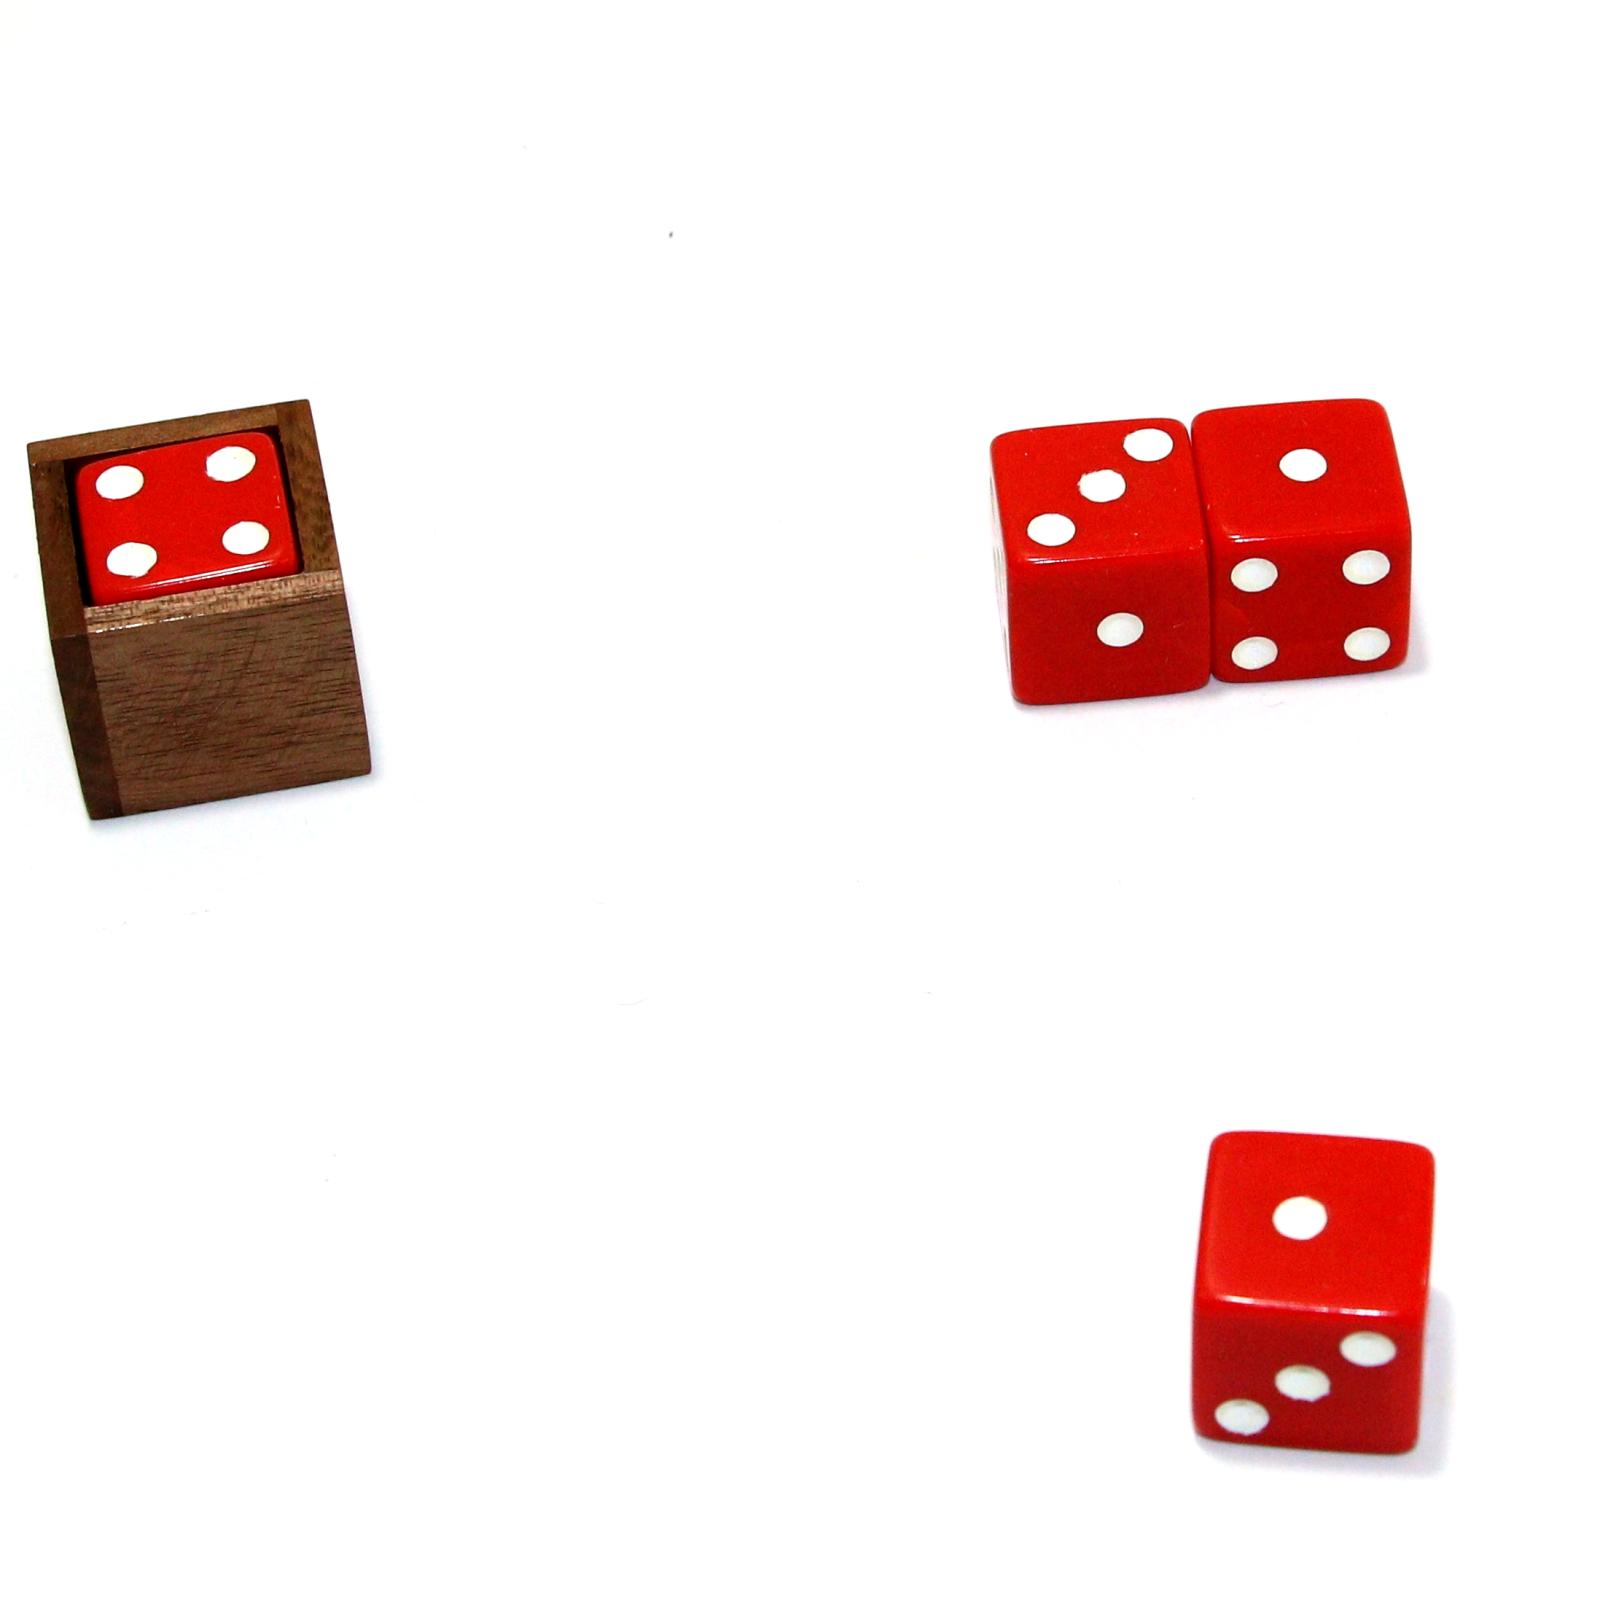 Jack Aviss Poker Pot by Louis Gaynor